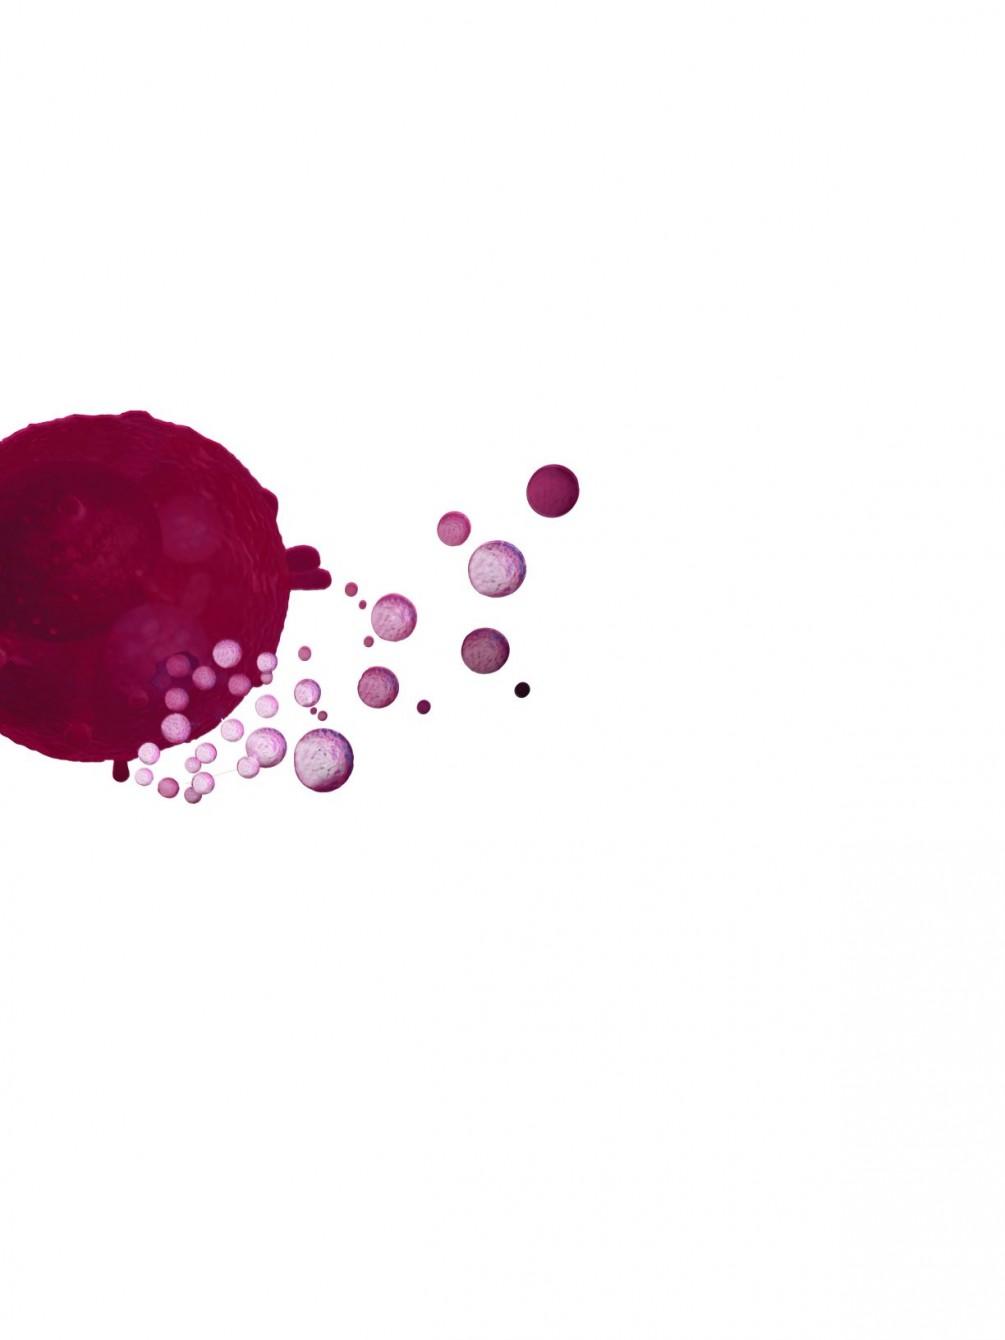 Exosome/EVs 的主要技術和分類? 含有什麼成分?